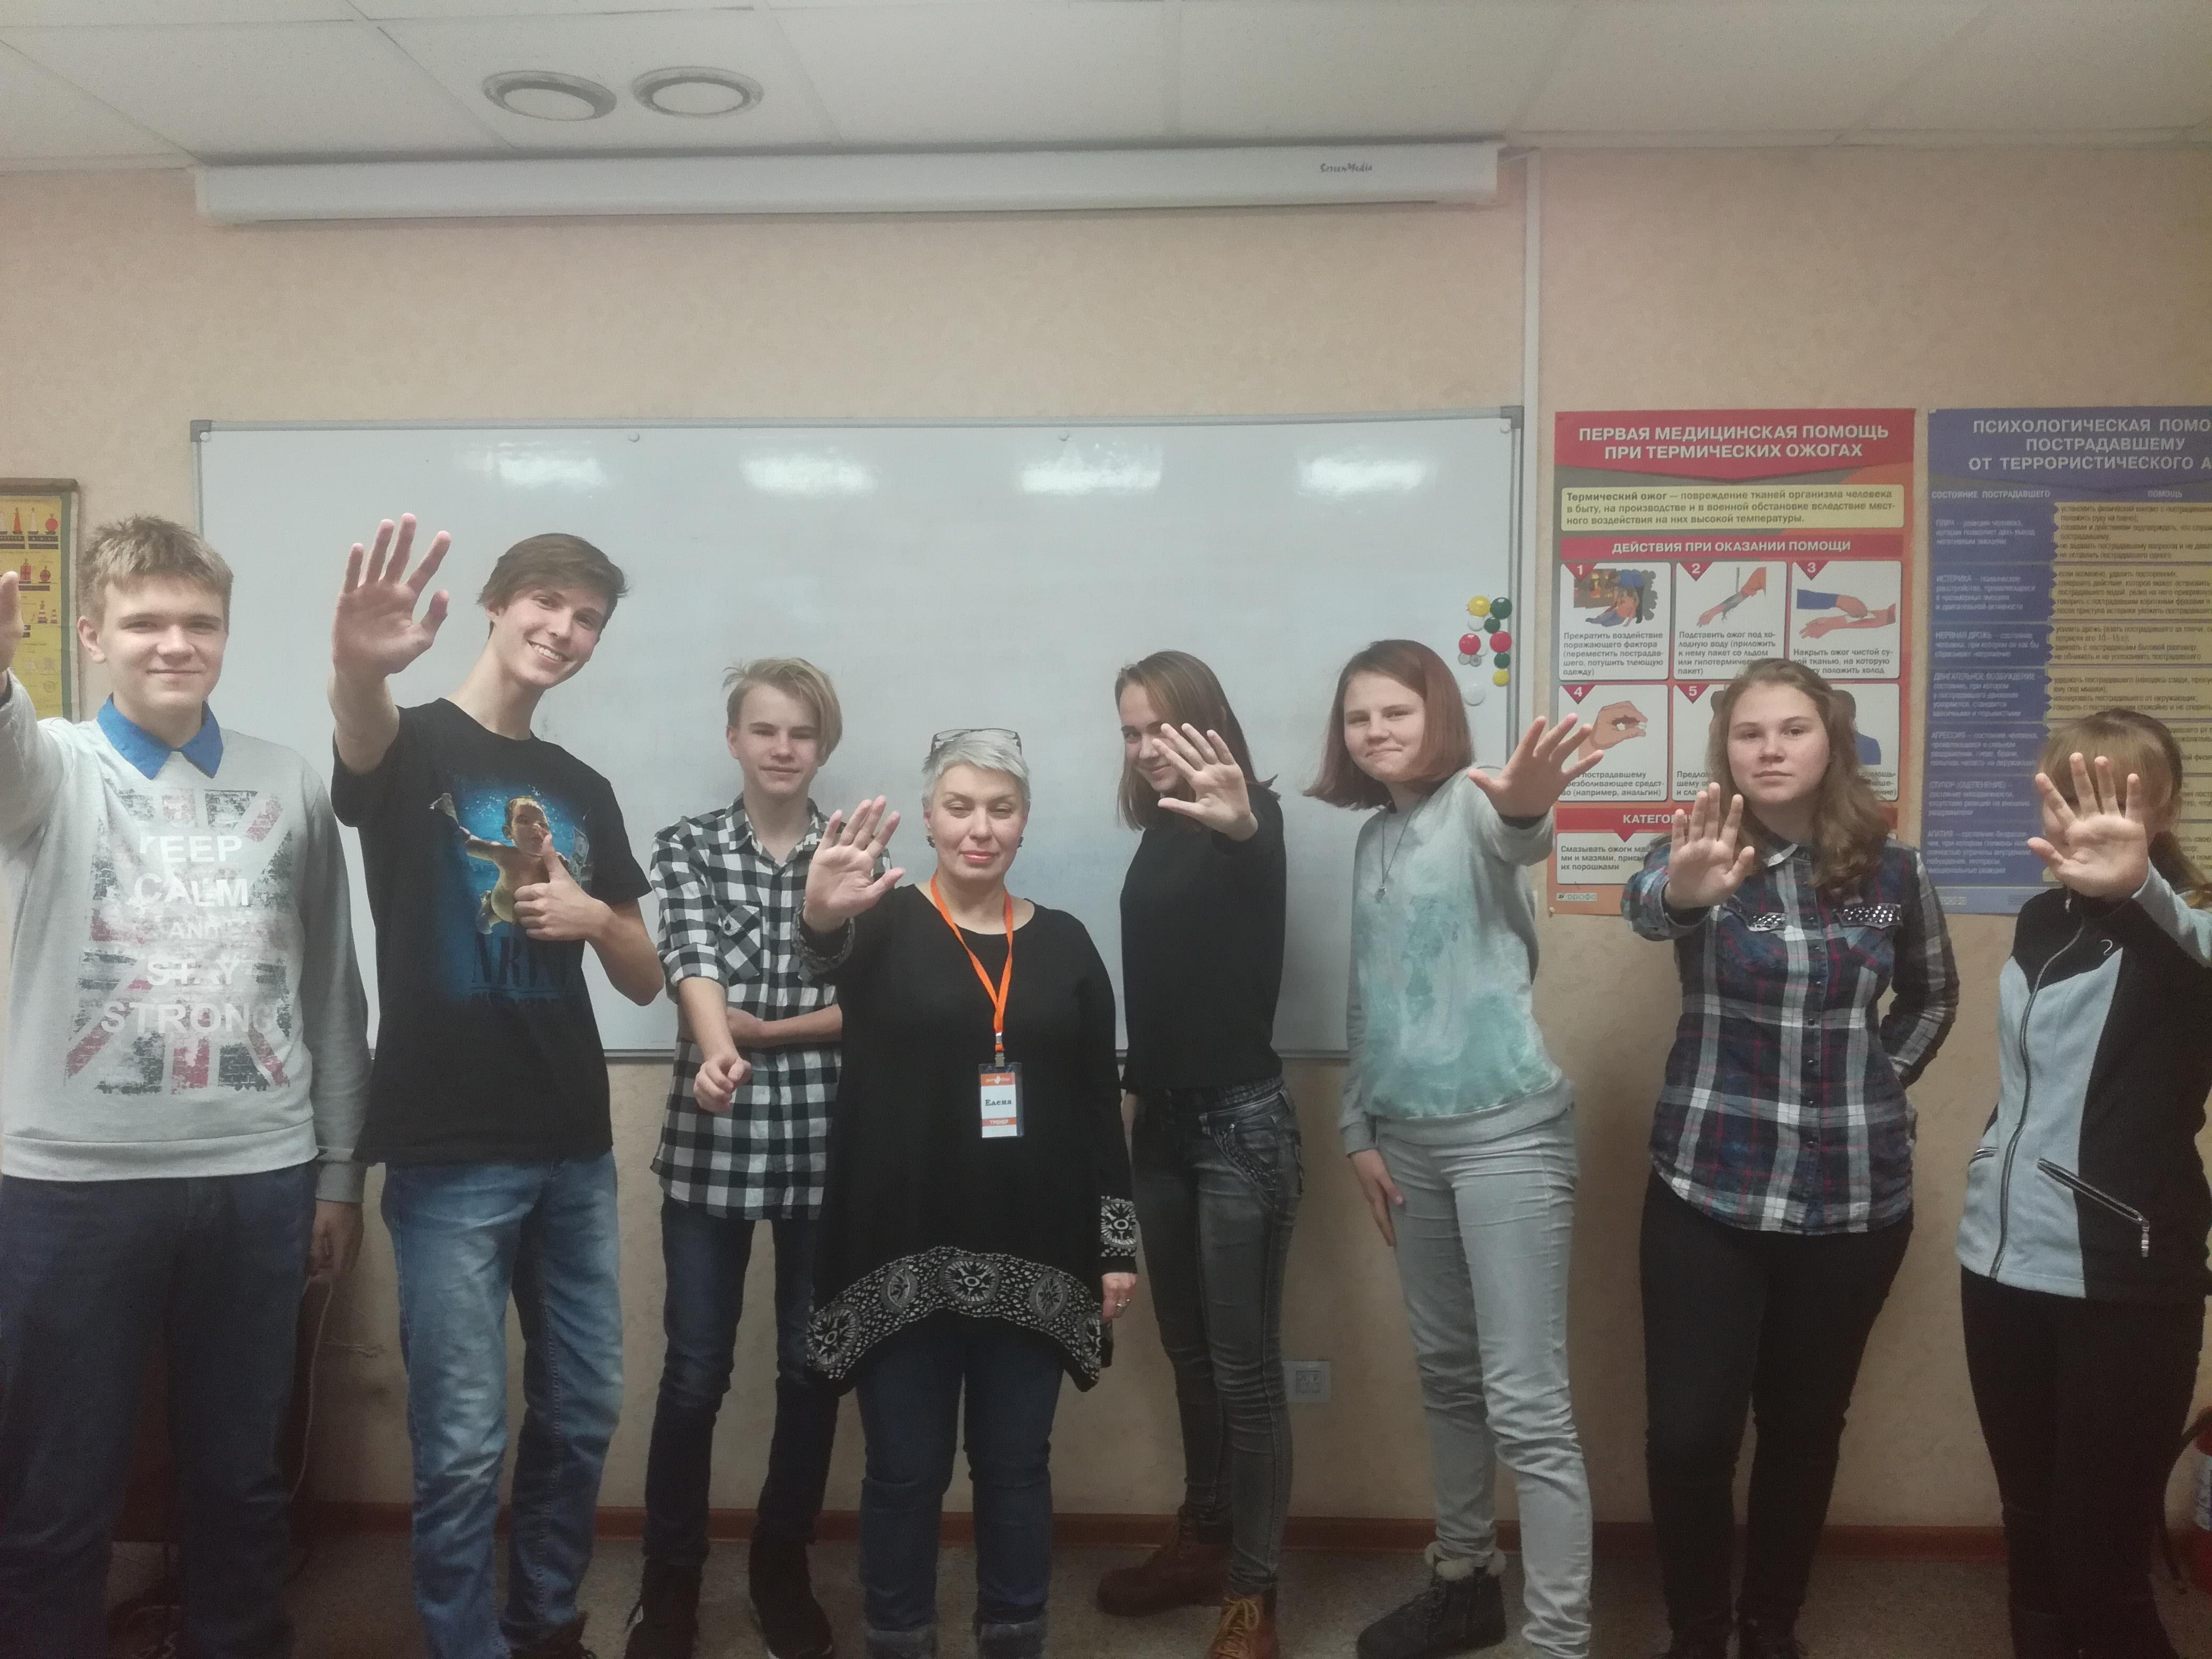 Стоп Угроза Новокузнецк